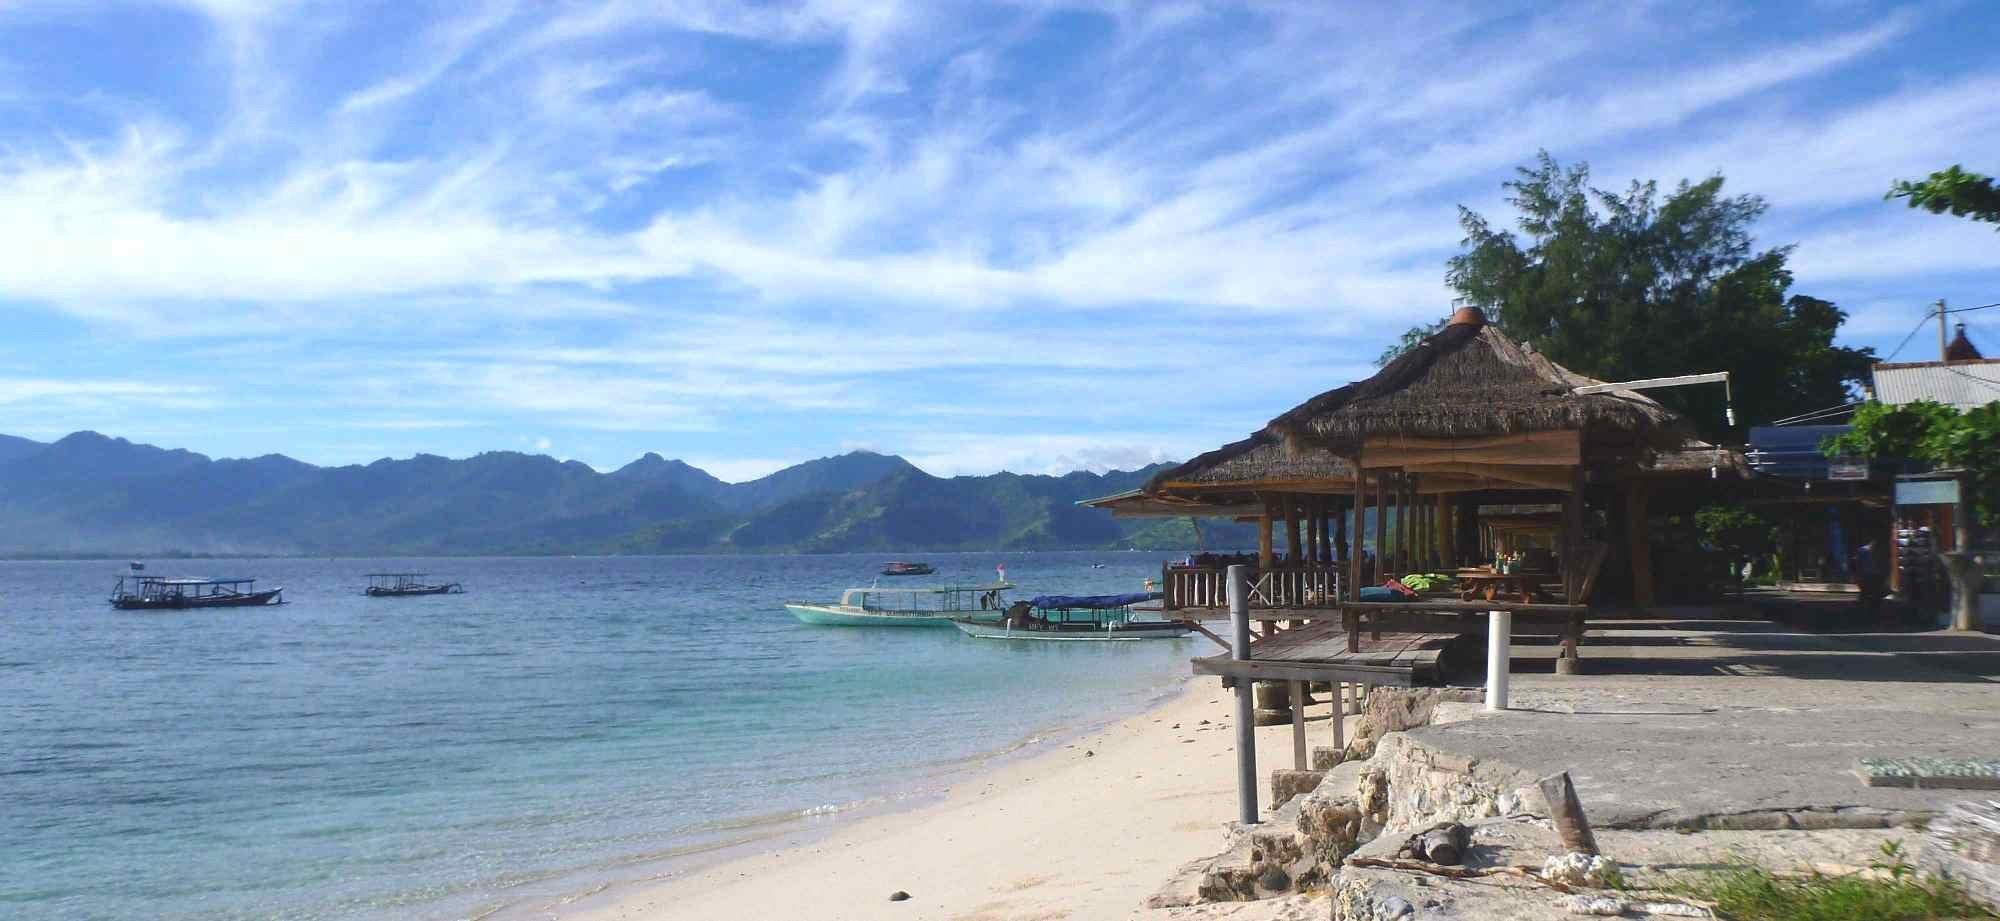 Bouwsteen 4 dagen Gili Meno vanaf Bali